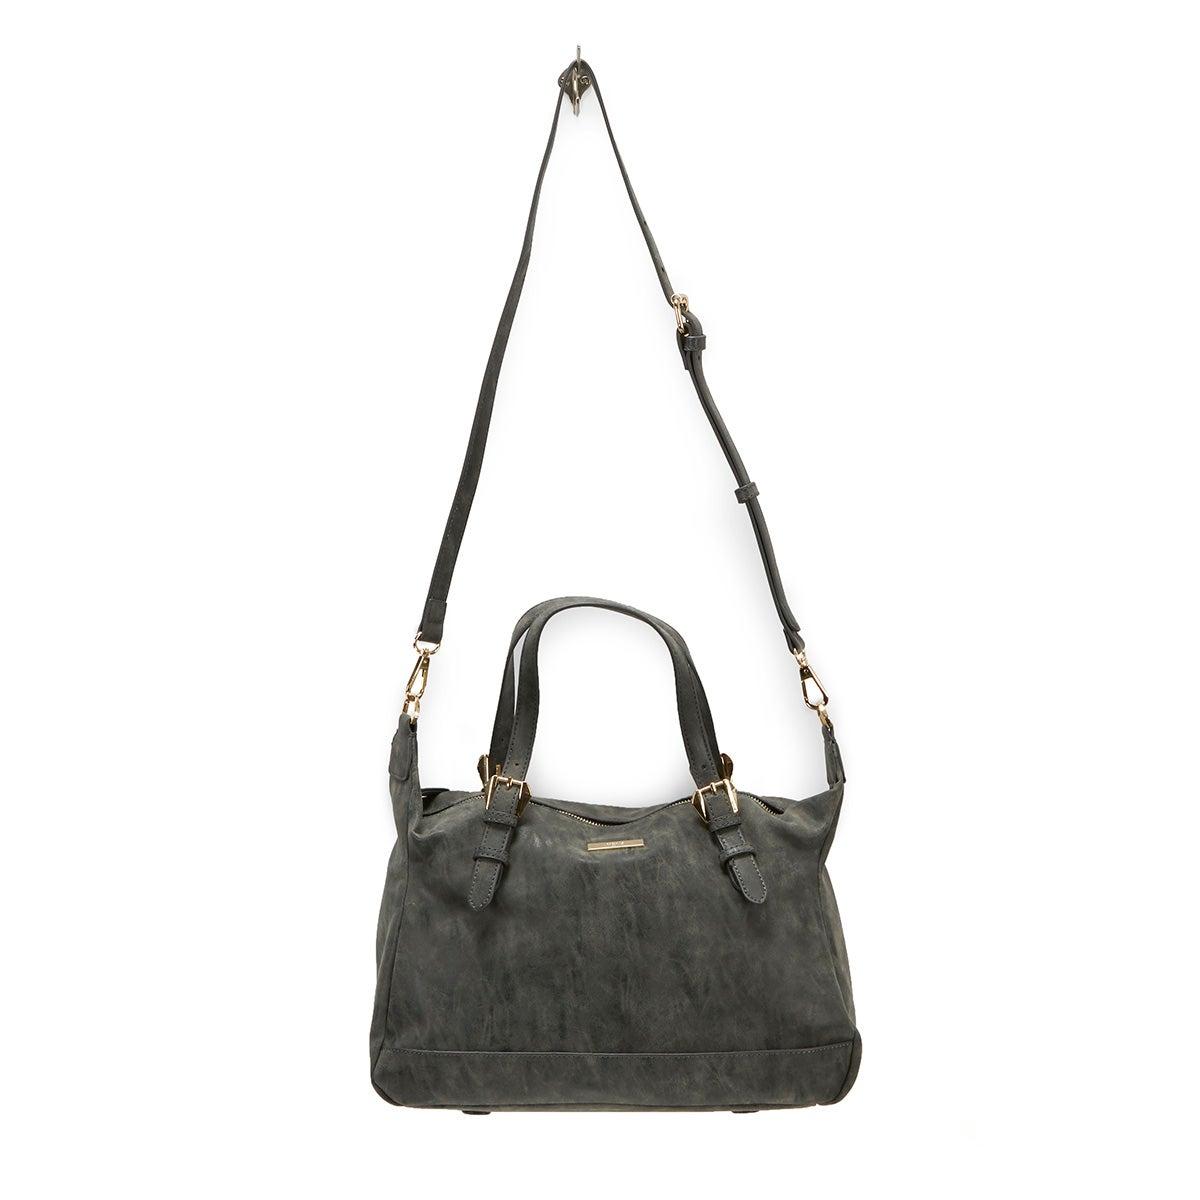 Lds Vintage black satchel